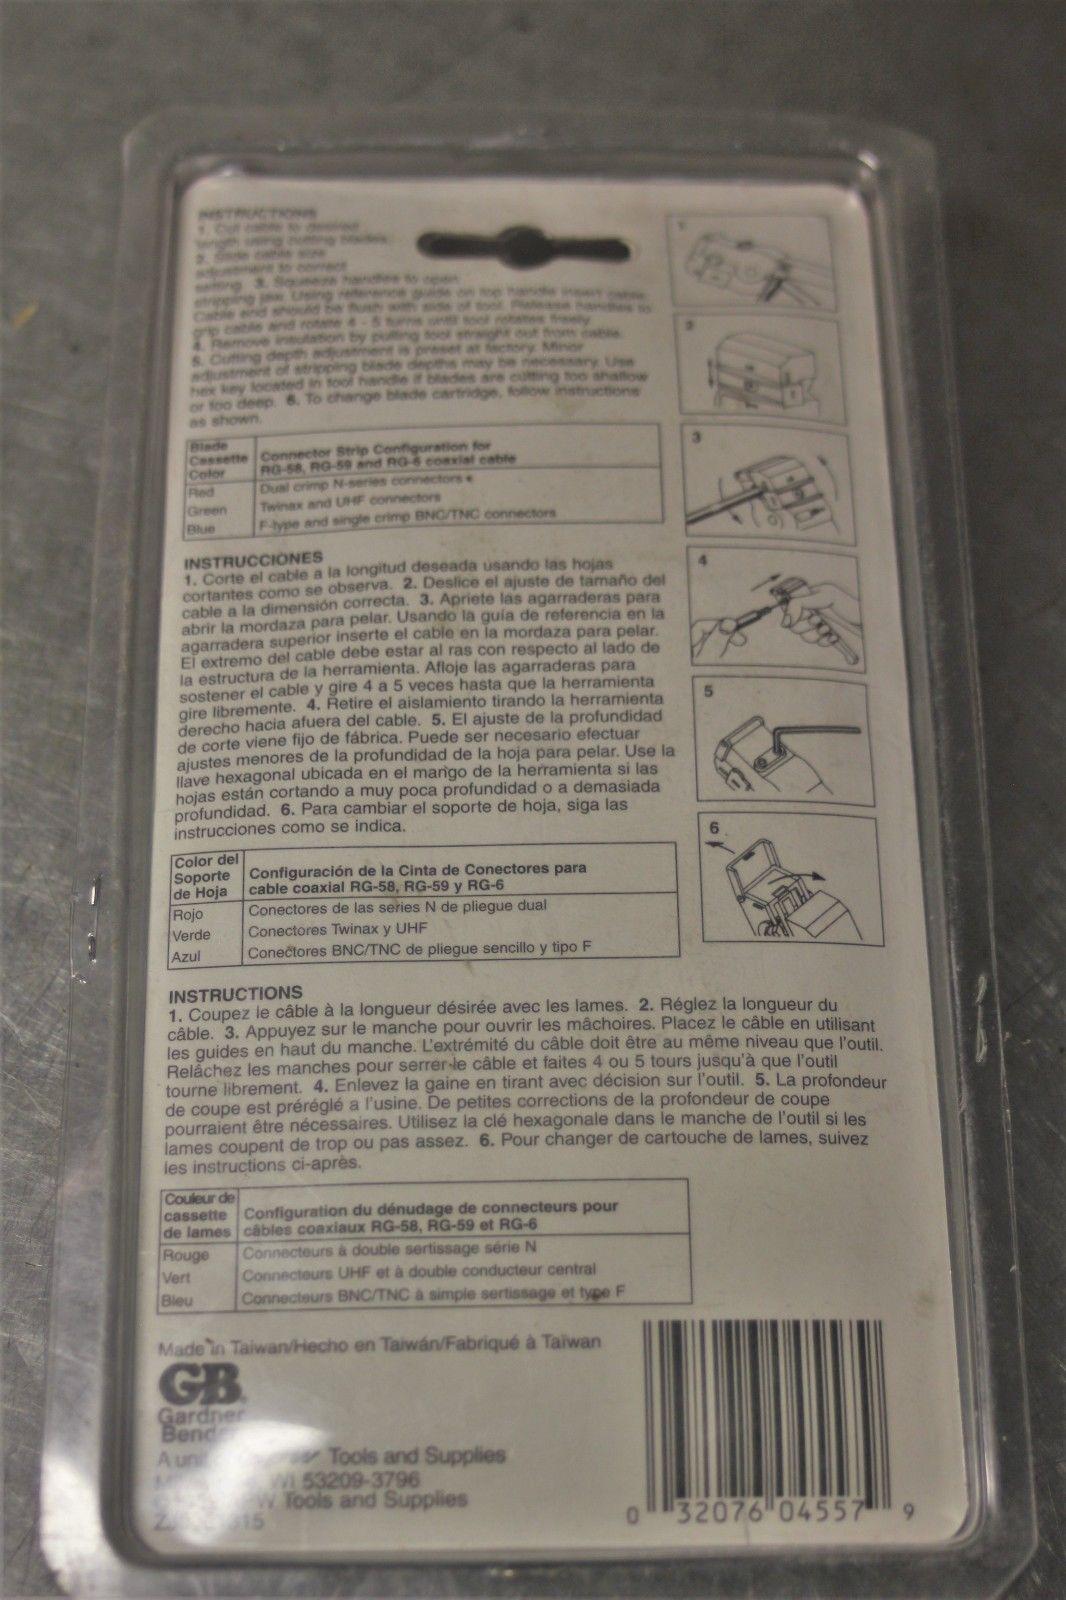 GB Coaxial Cable Stripper SE-98RGB